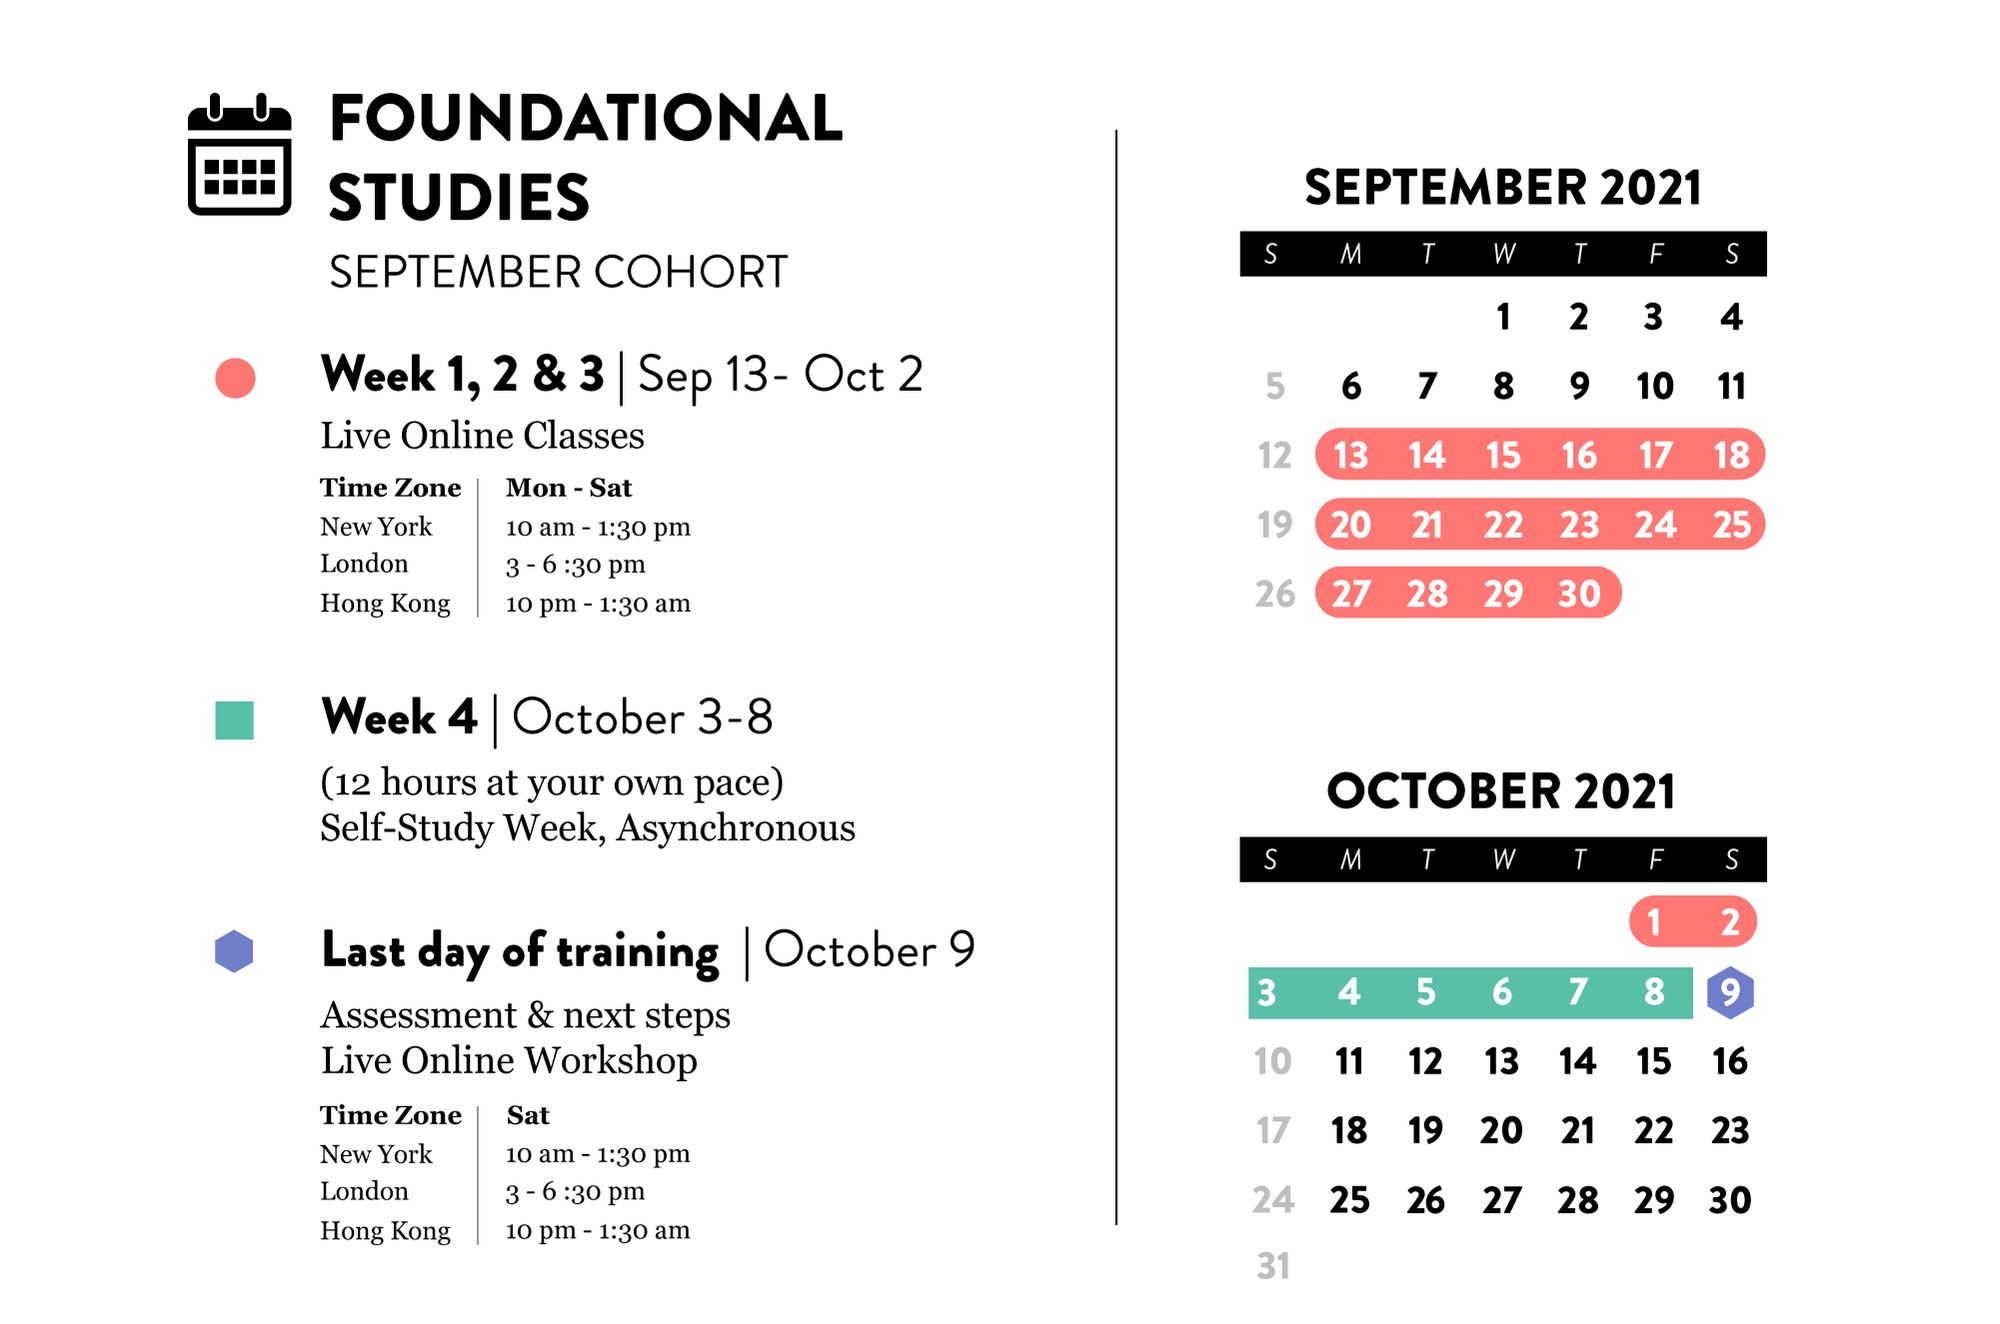 September 2021 Cohort